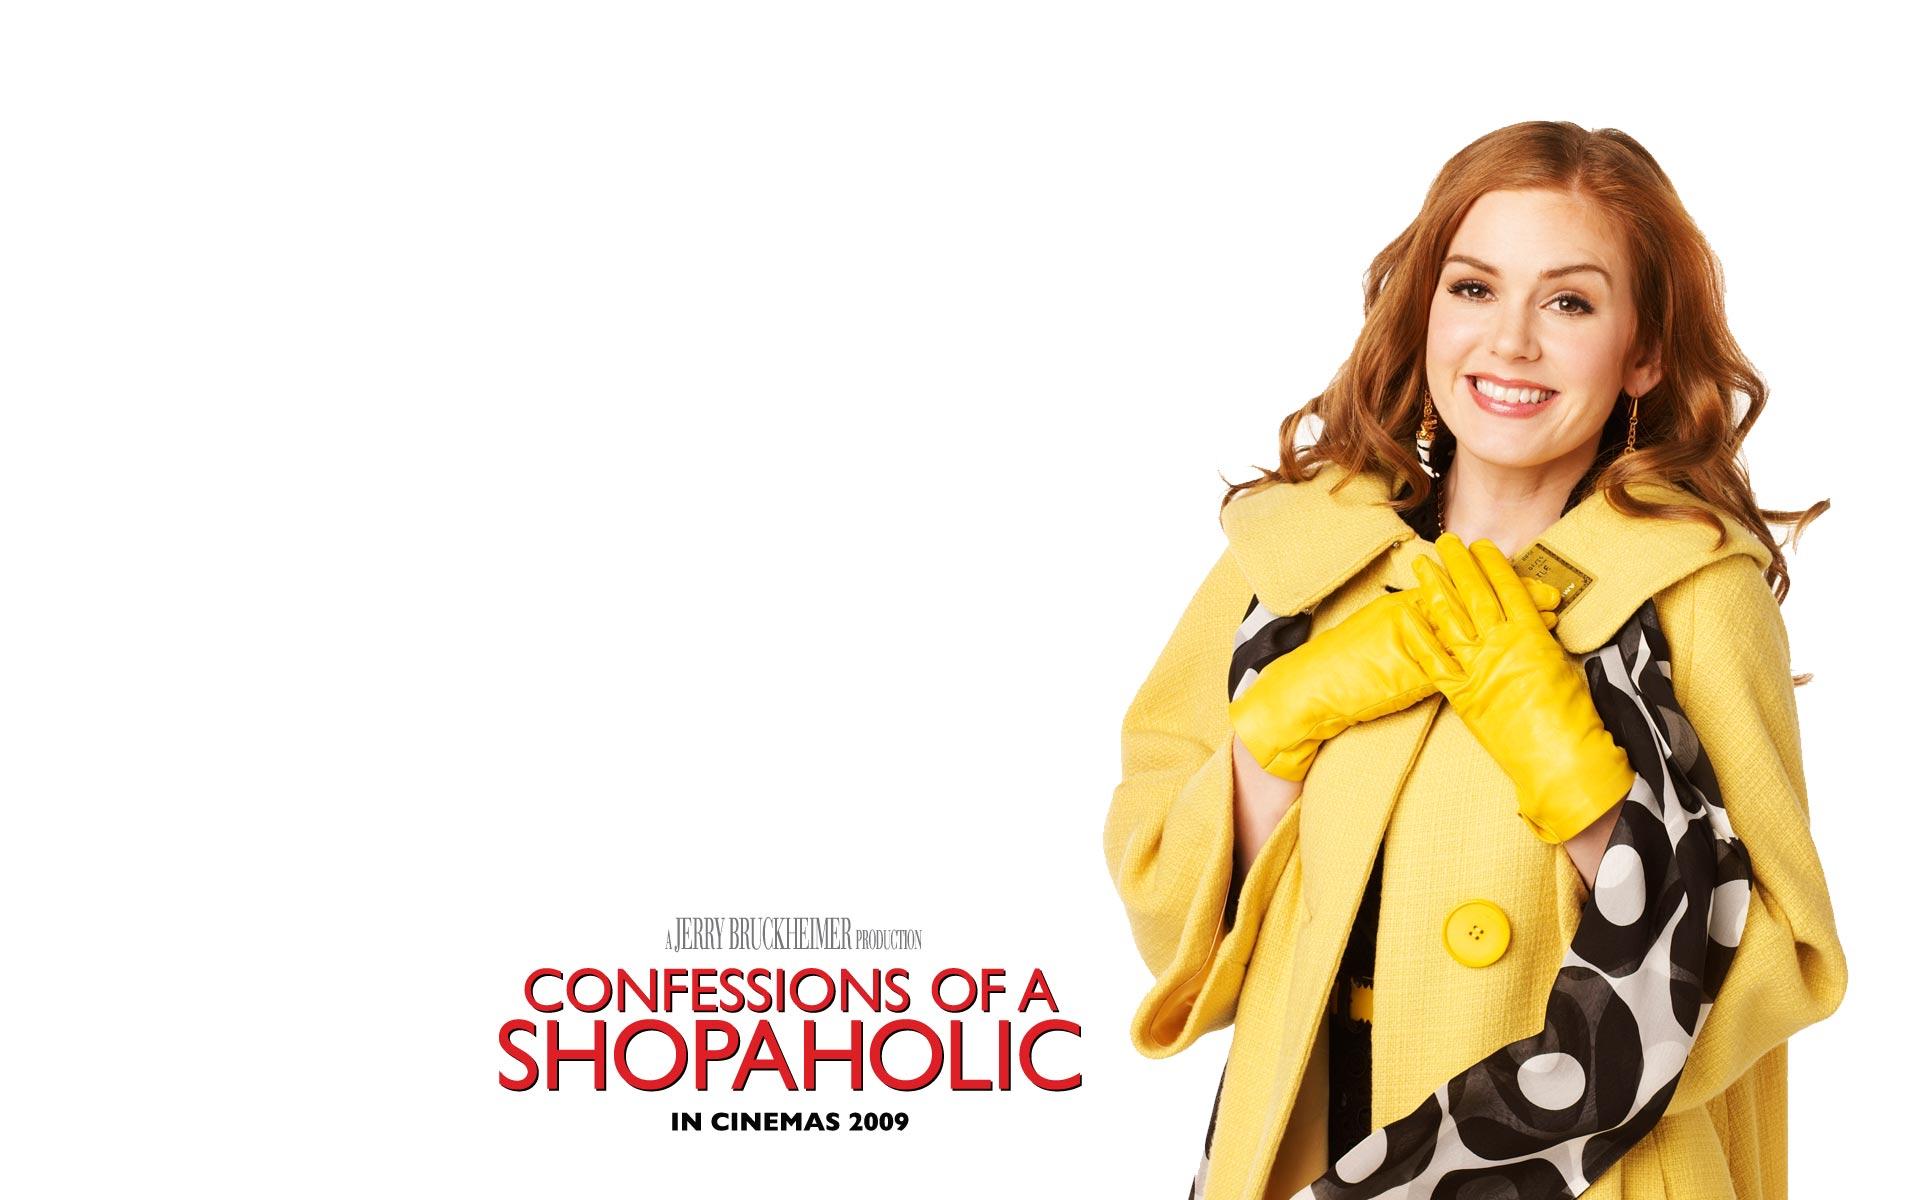 Confessions Of A Shopaholic   Confessions of a Shopaholic Movie 1920x1200